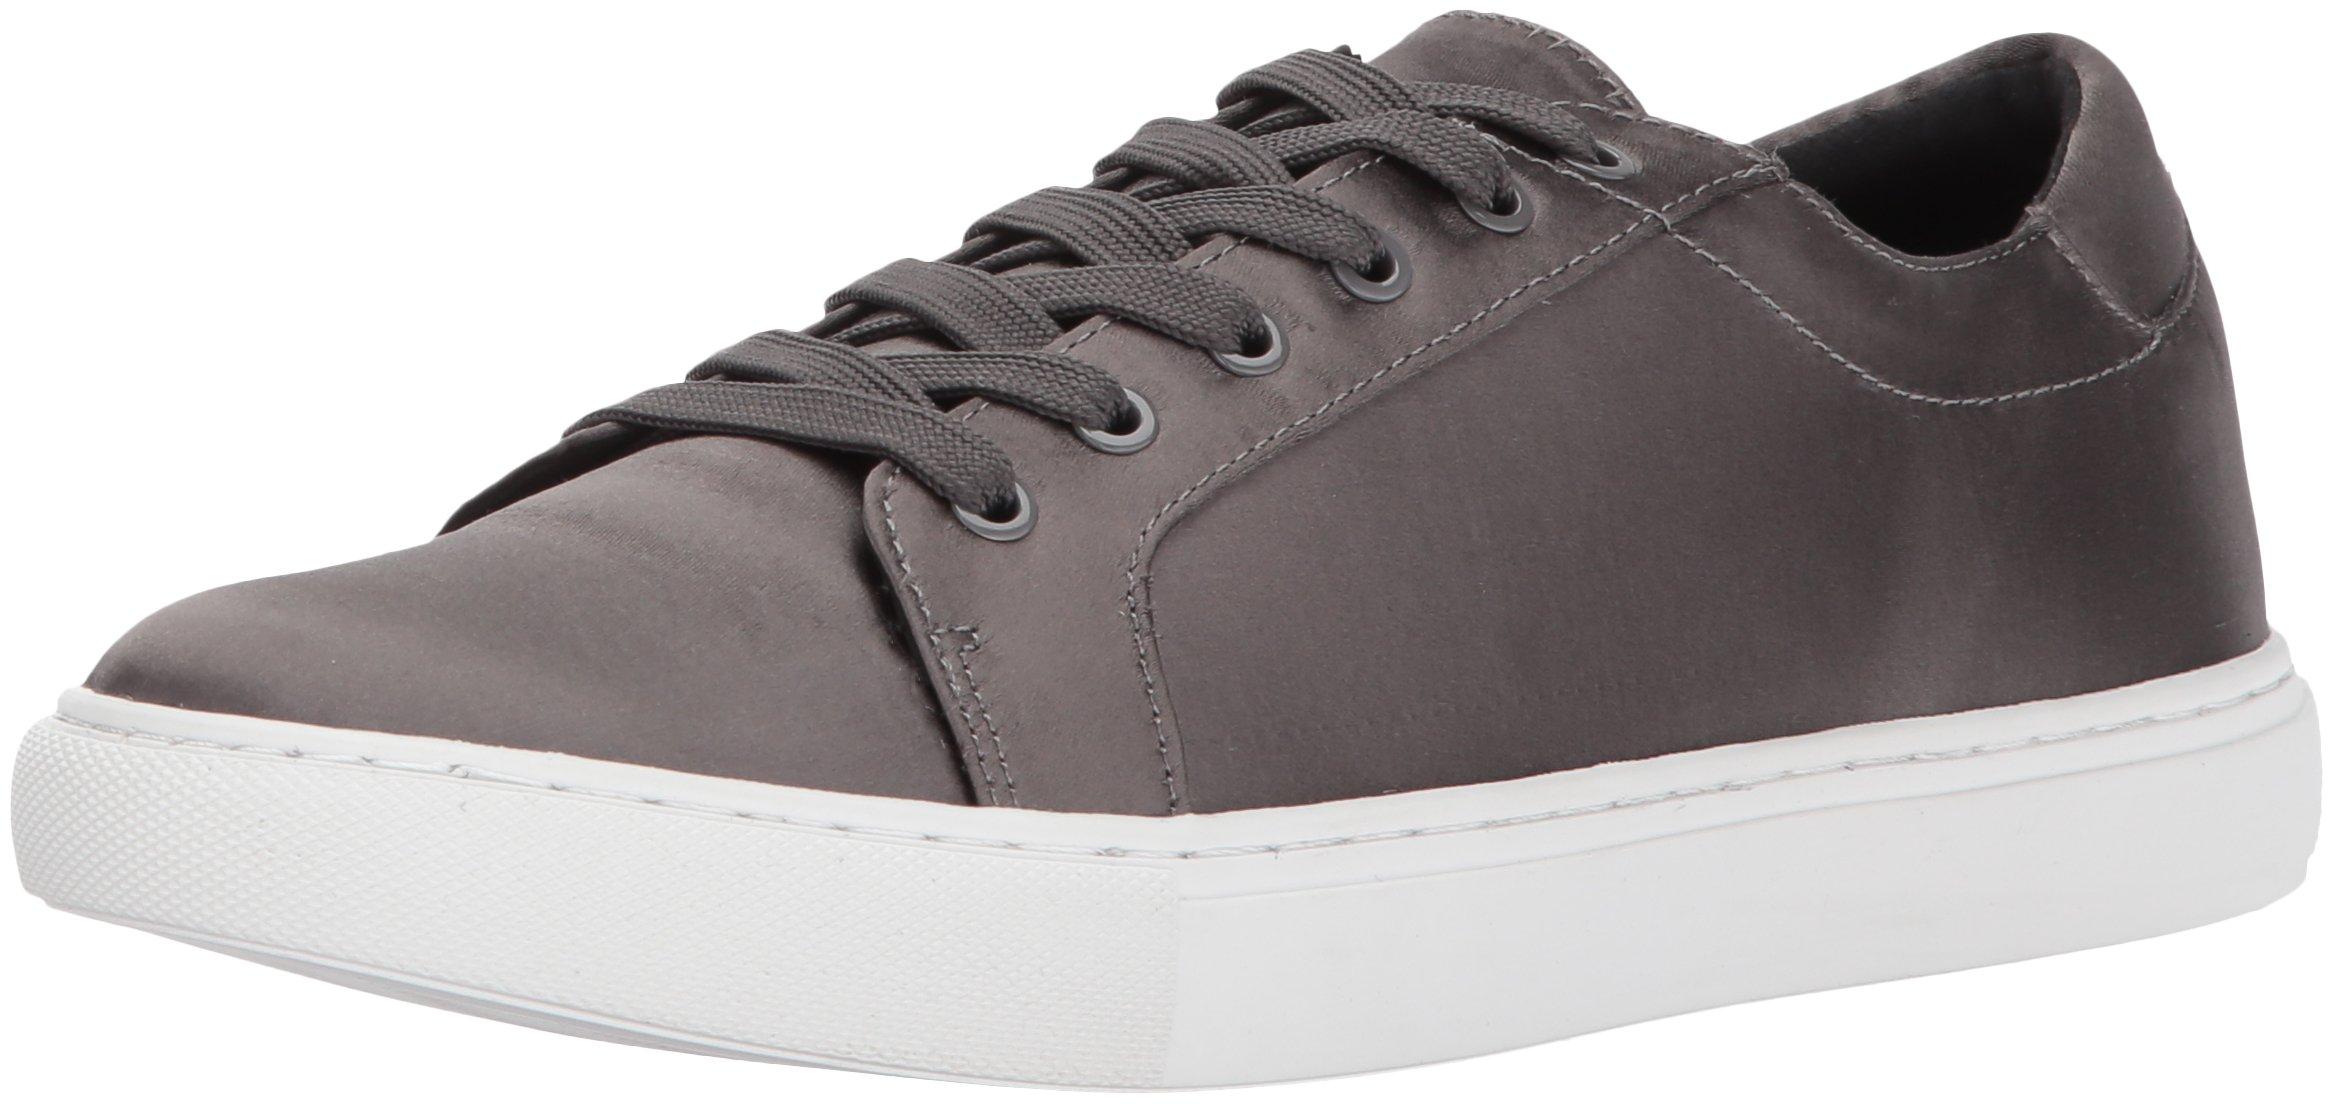 Kenneth Basses Eu KamSneakers Cole FemmeGrischarcoal39 edCxBor